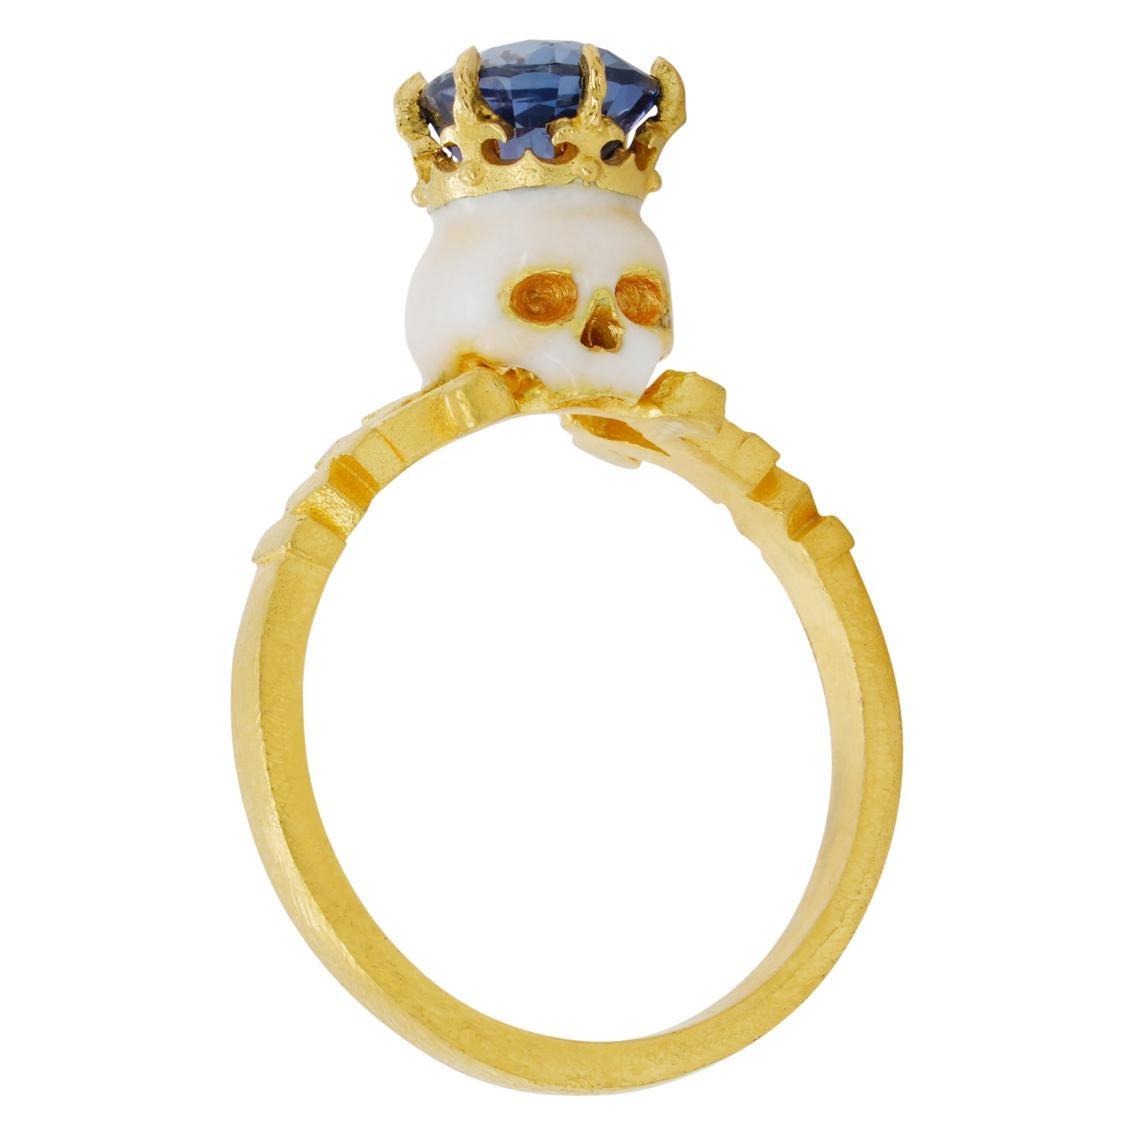 Catacomb Saint Skull Ring in 22 Karat Gold, Enamel and Violet Blue Sapphire